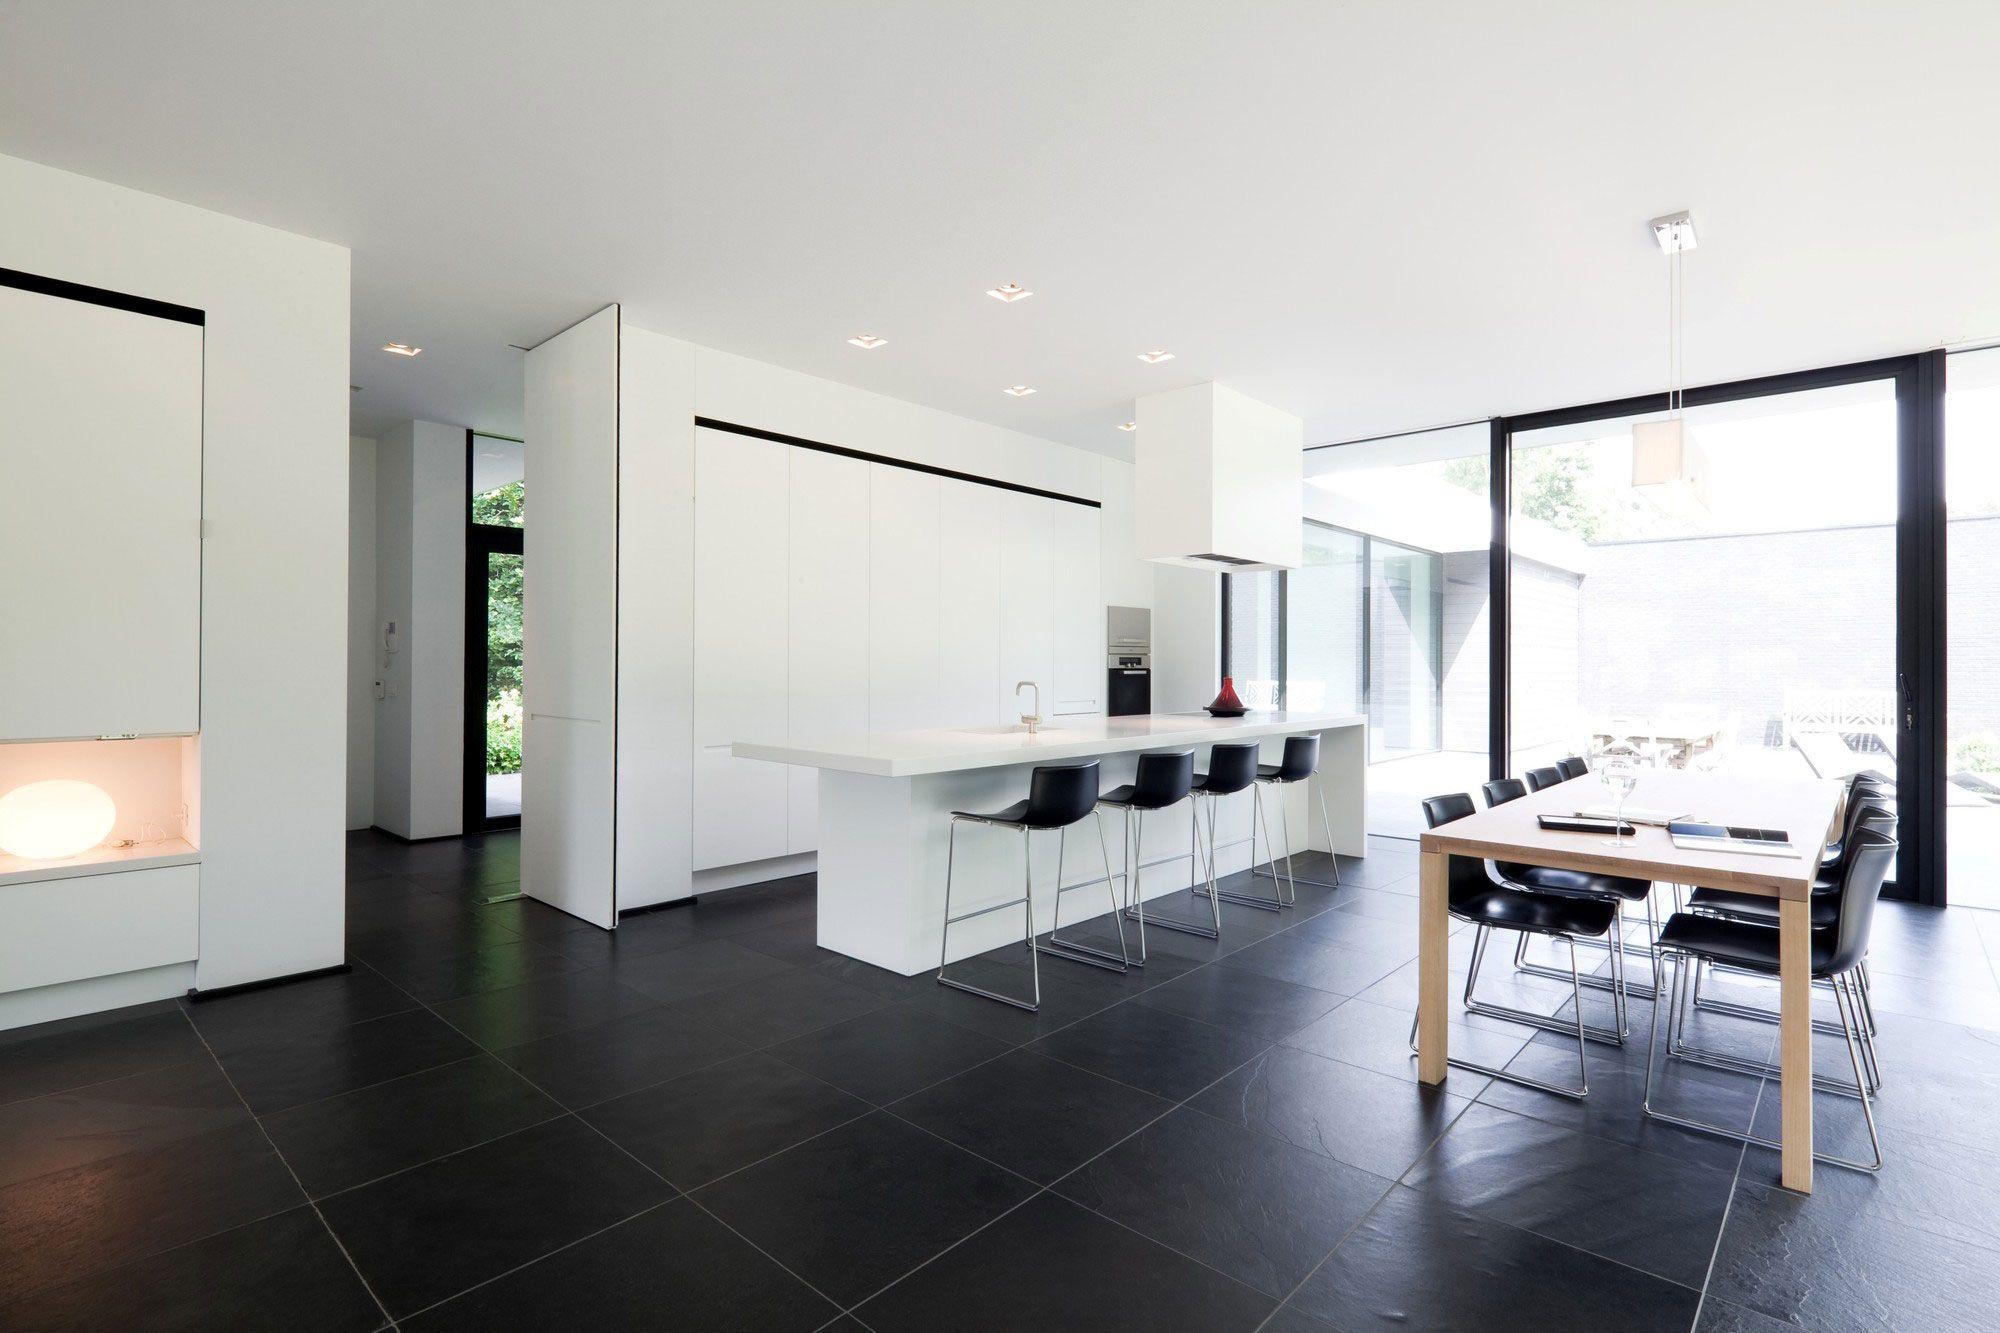 House House Faes by HVH Architecten